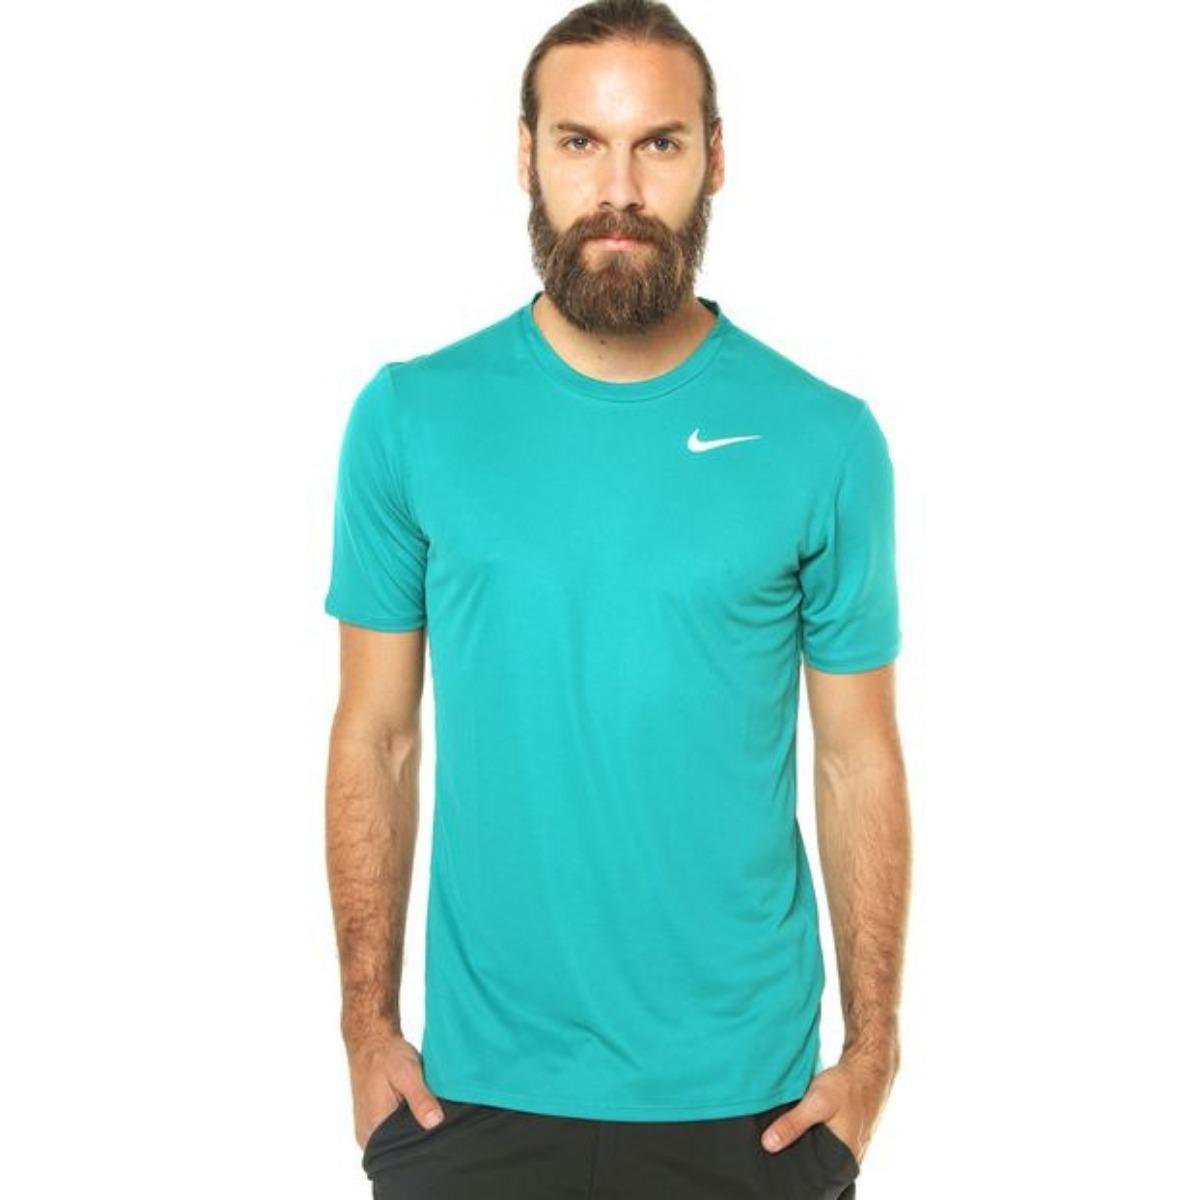 5910e5cfe1 camiseta nike masculina dri-fit racer - azul claro. Carregando zoom.